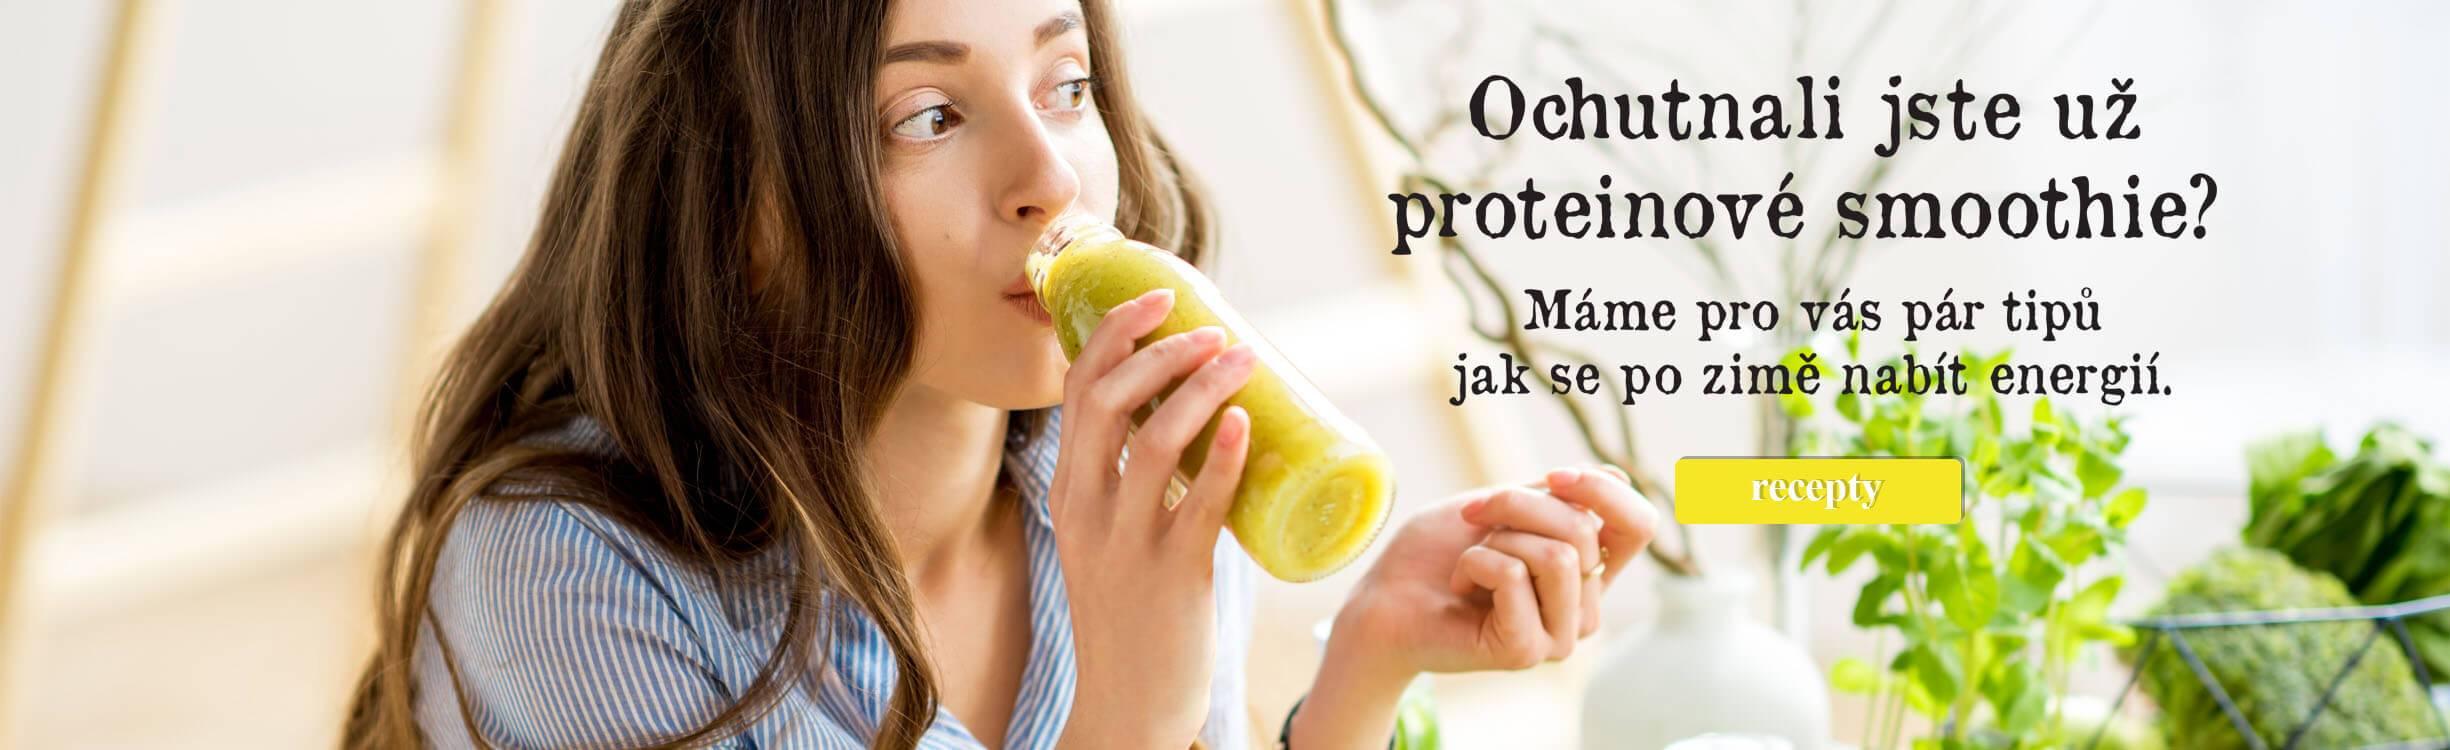 Fitness recepty, proteinové smoothie